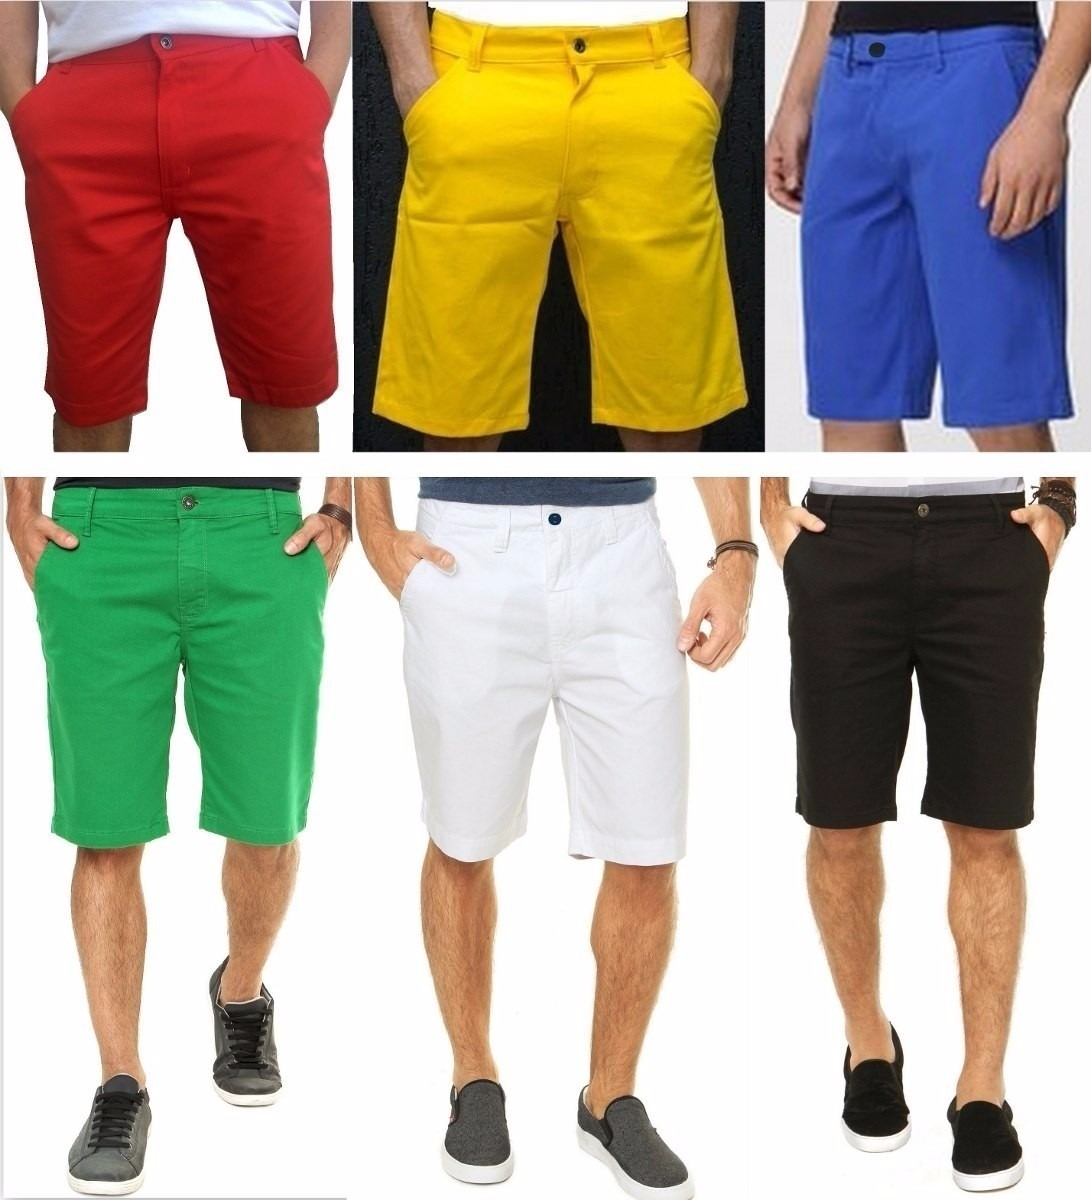 Bermuda masculina sarja polo lacoste tommy jeans colorida carregando zoom  jpg 1091x1200 Bermudas masculinas lacoste 91c163ac778